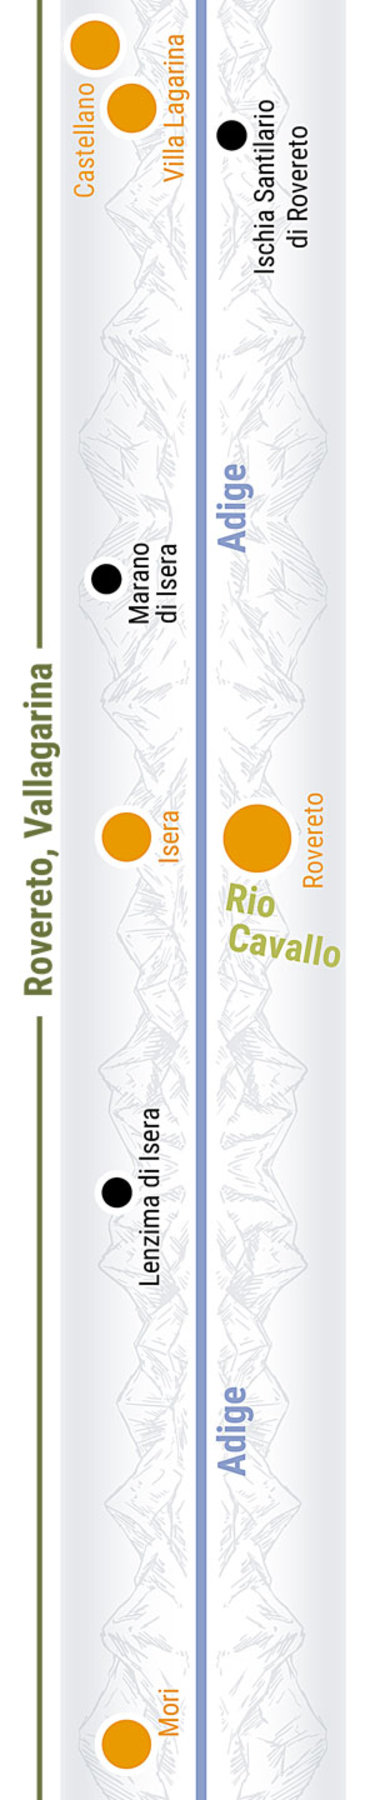 Übersichtskarte rechts Teilabschnitt 33p Rovereto